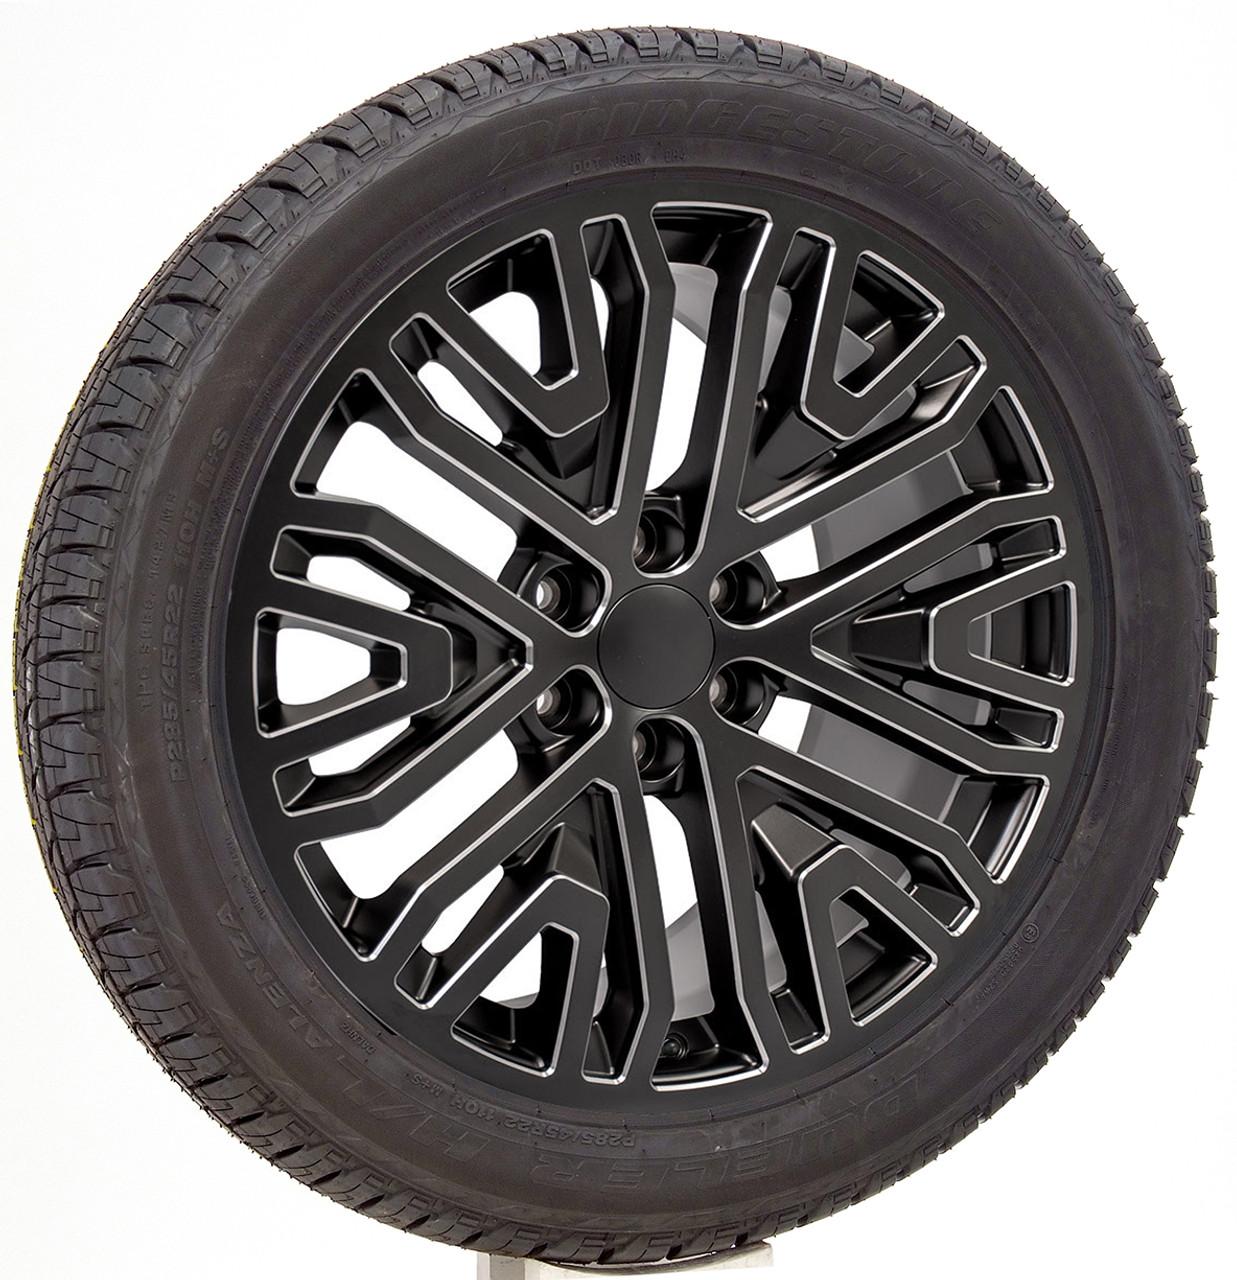 "Black with Milled Edge 22"" Six Split Spoke Wheels with Bridgestone Tires for Chevy Silverado, Tahoe, Suburban - New Set of 4"